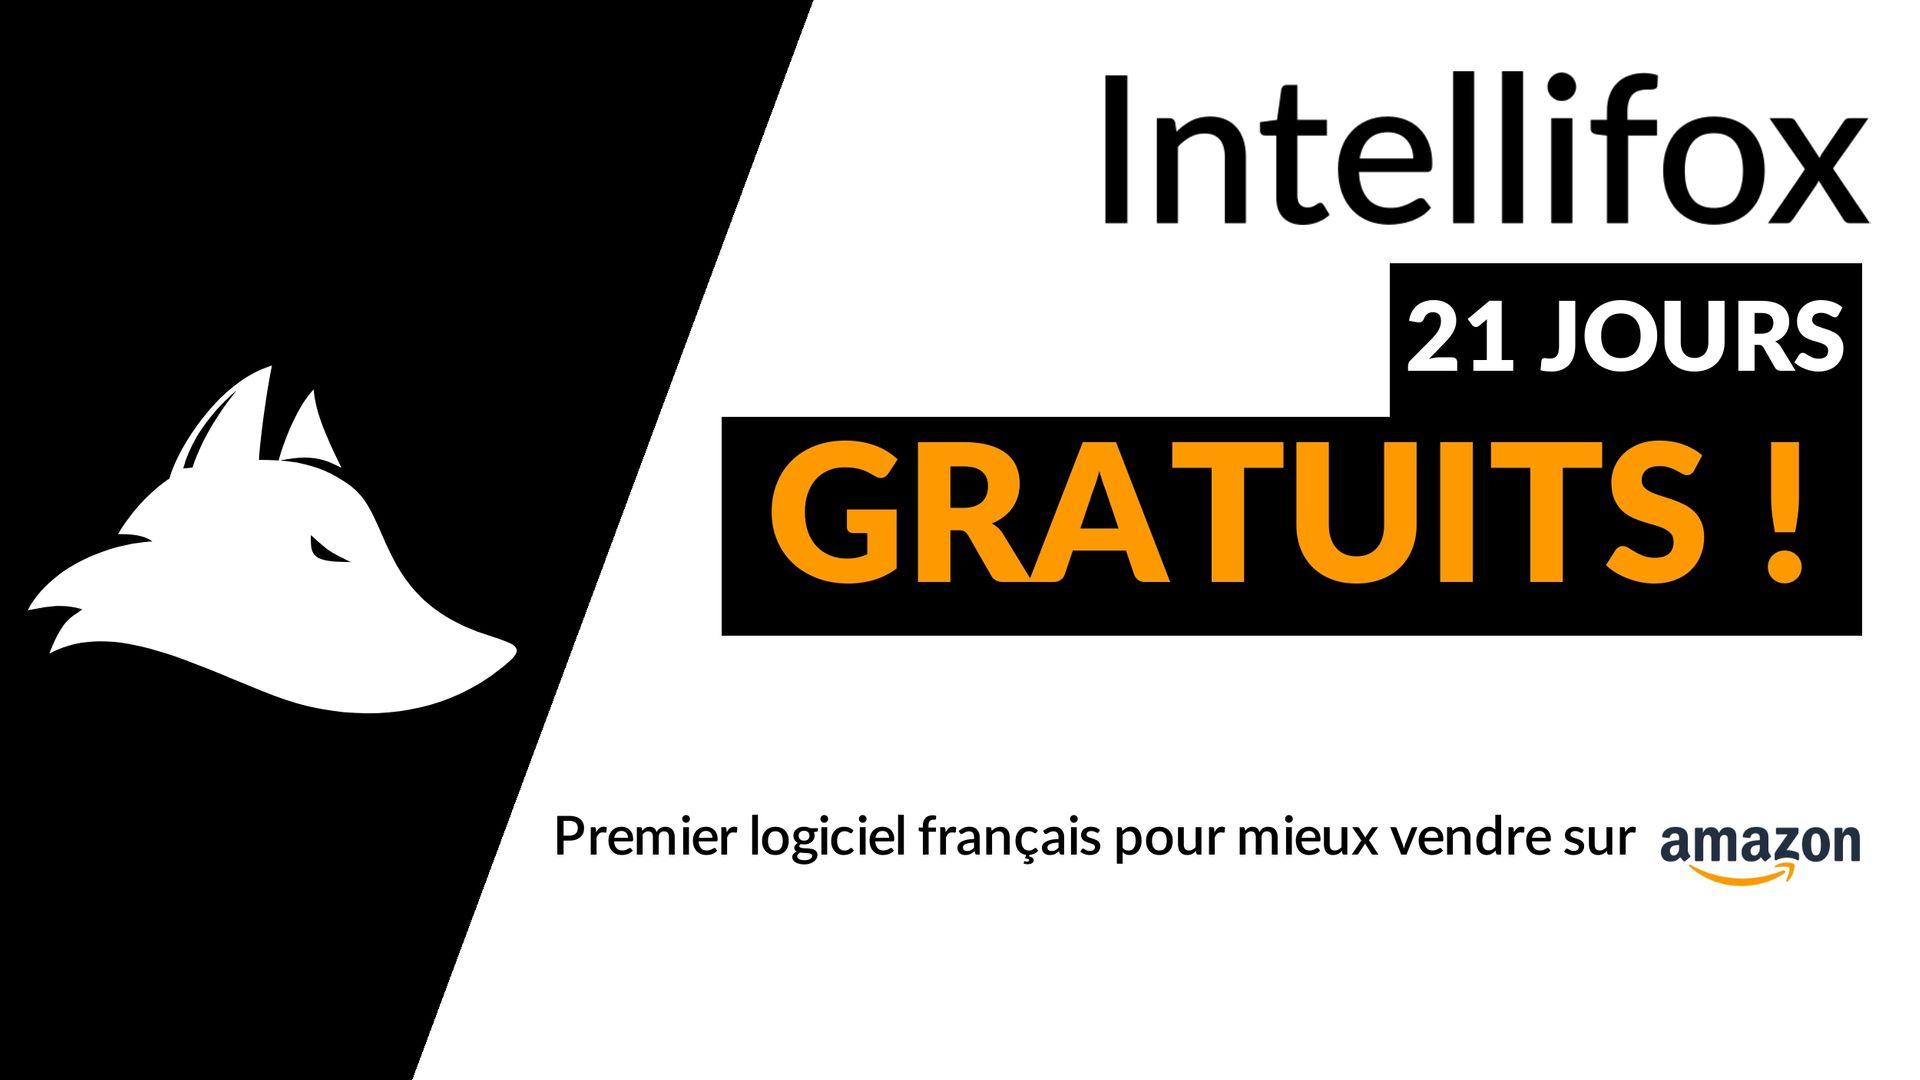 Intellifox - 21 jours gratuits